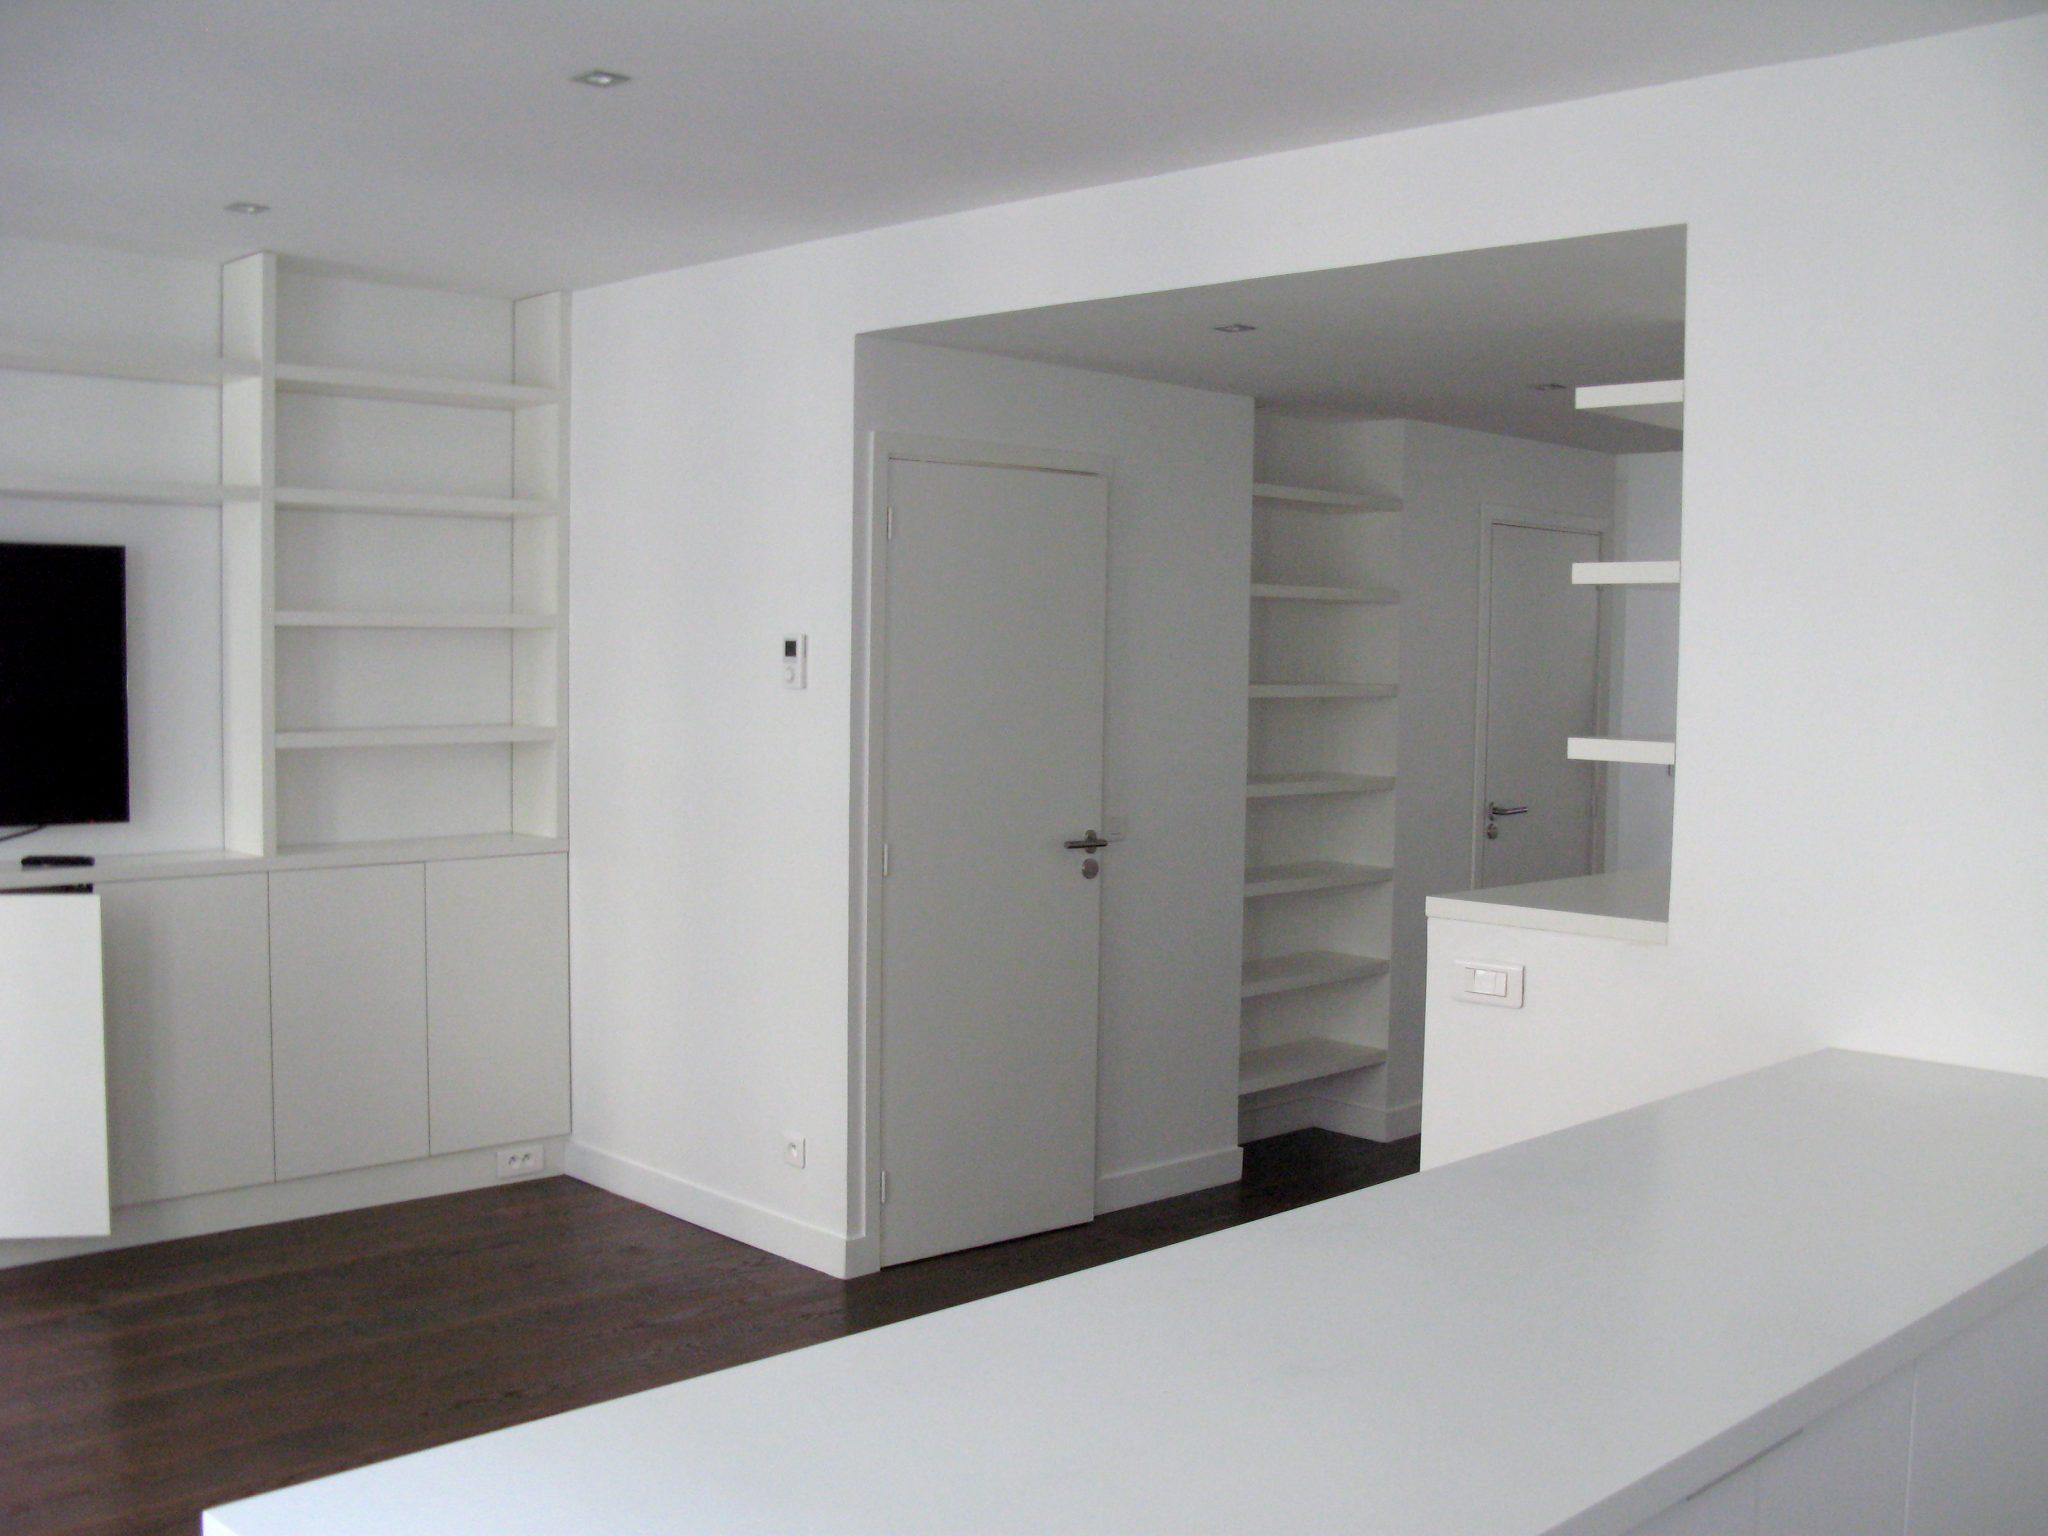 Appartement y a paris nea architects agence d 39 architecture for Agence logement